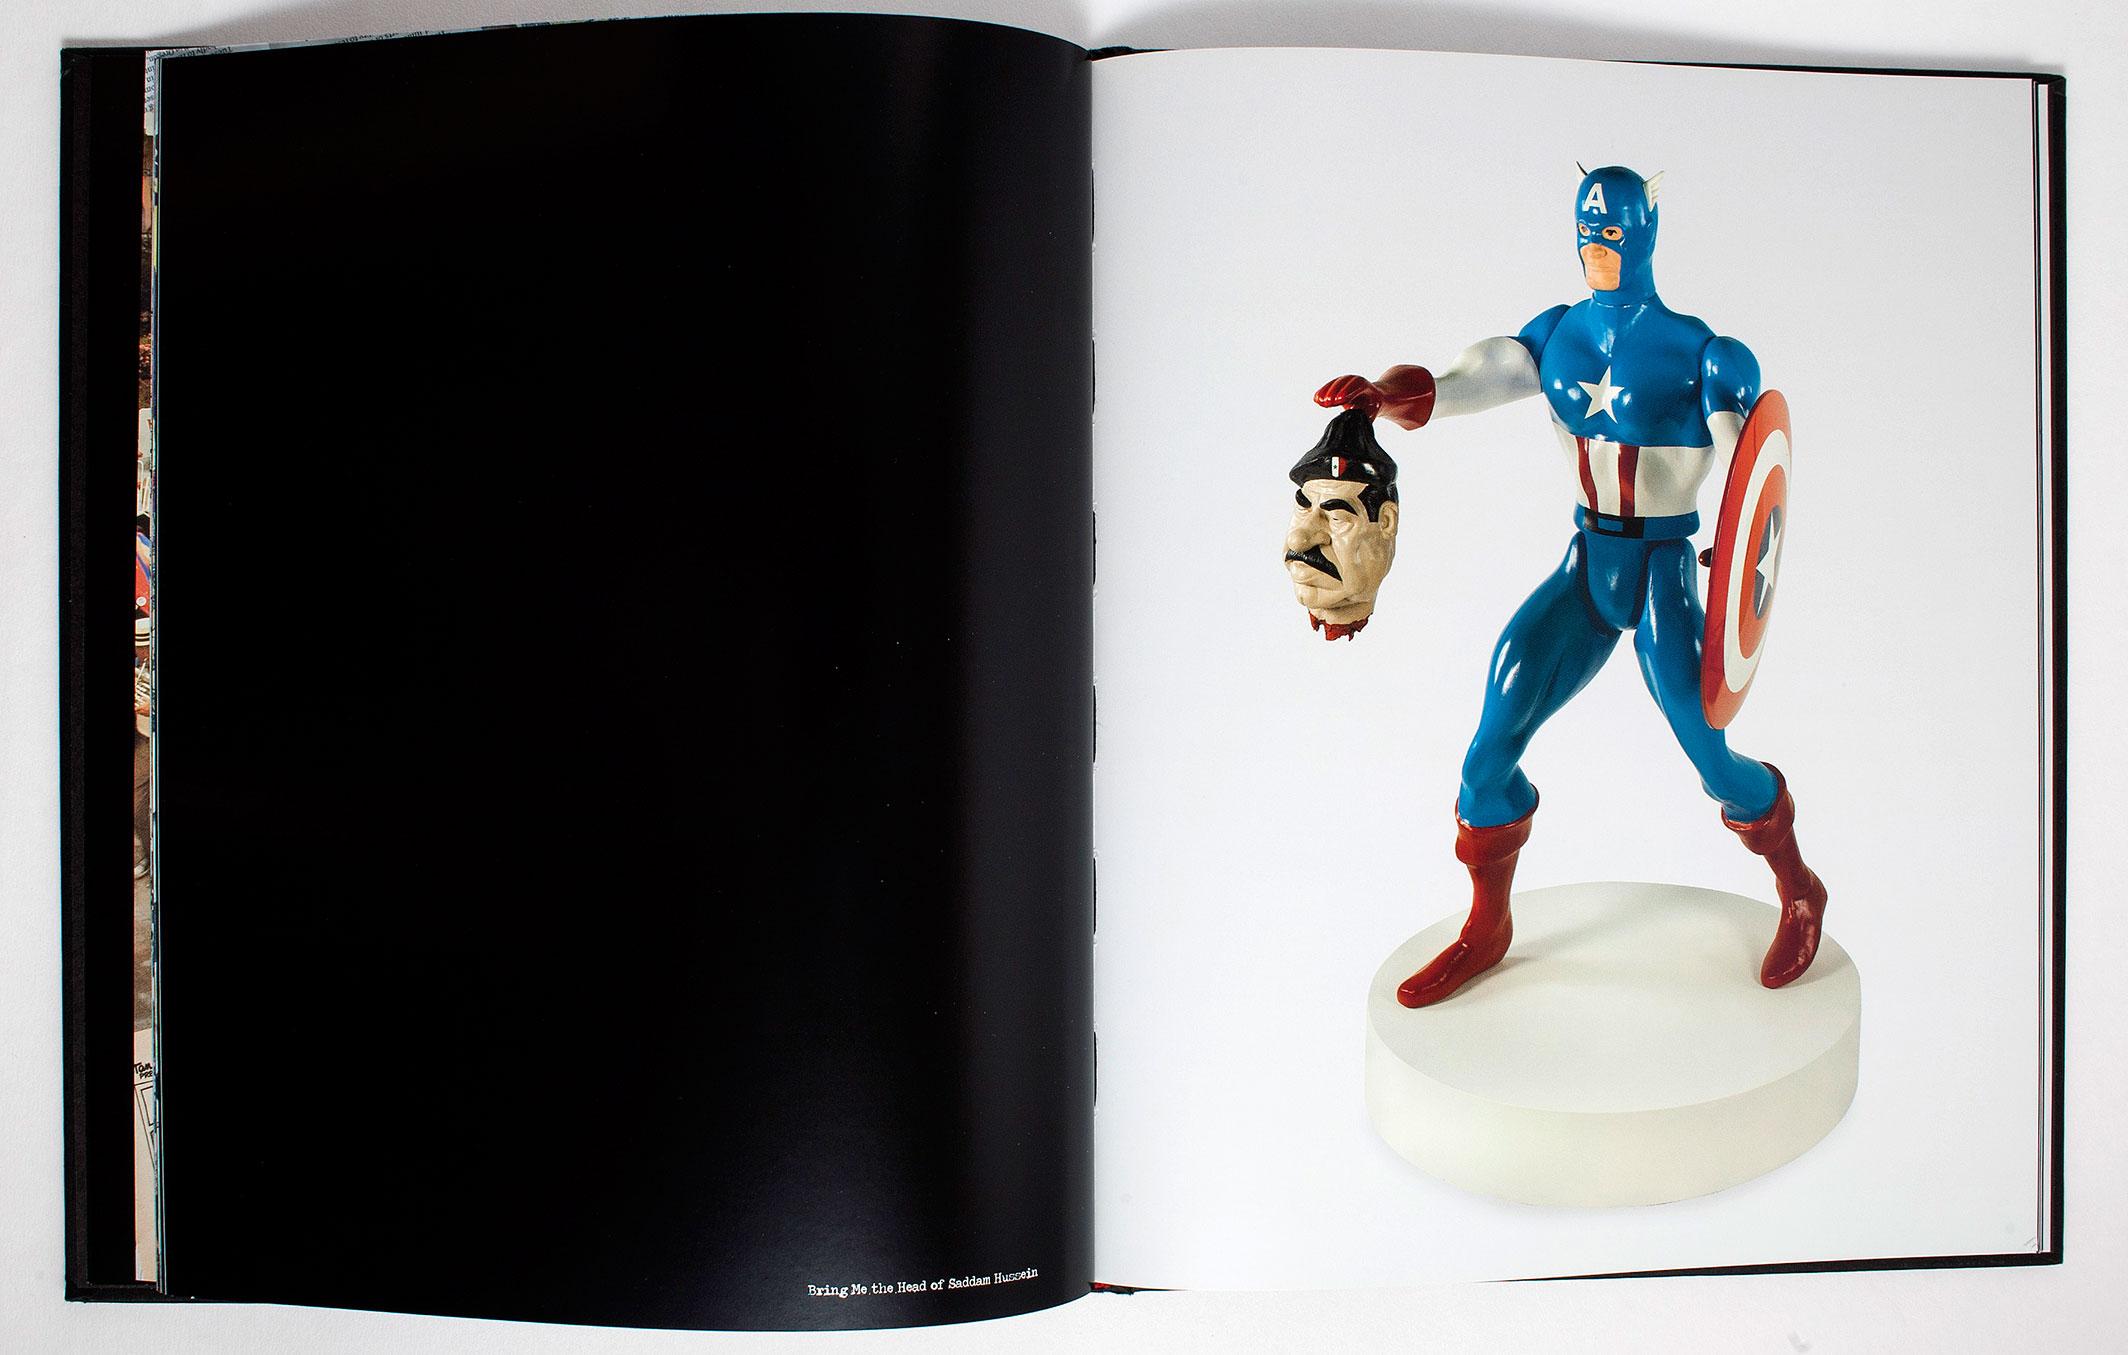 epm-print-management-bristol-art-books-ben-turnbull-3.jpg